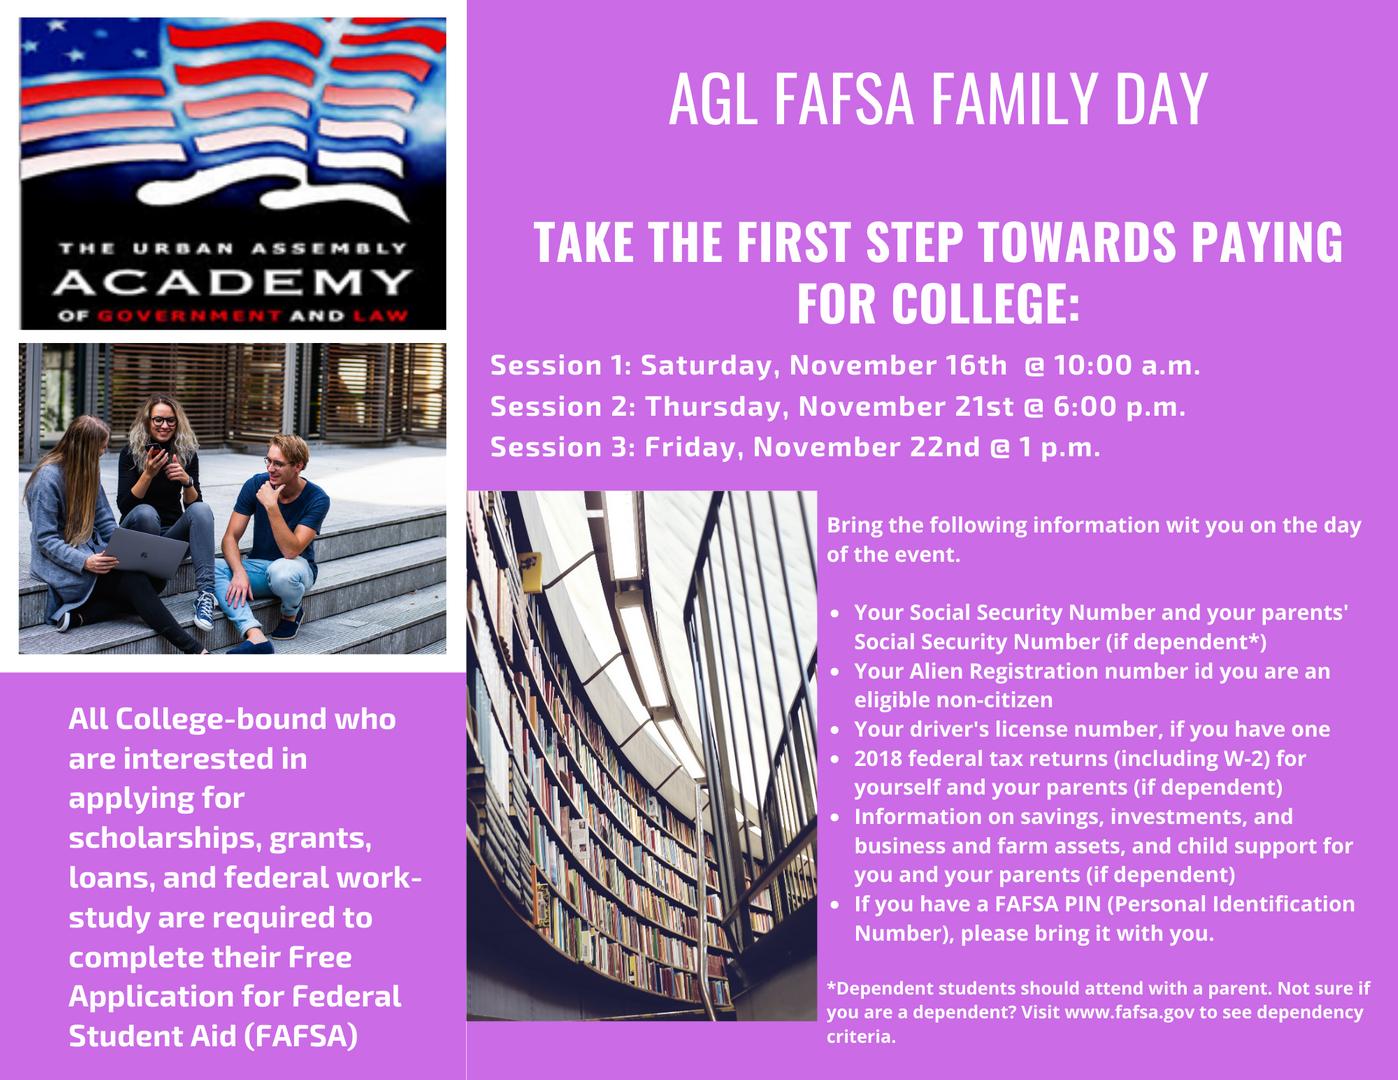 AGL FAFSA Family Day